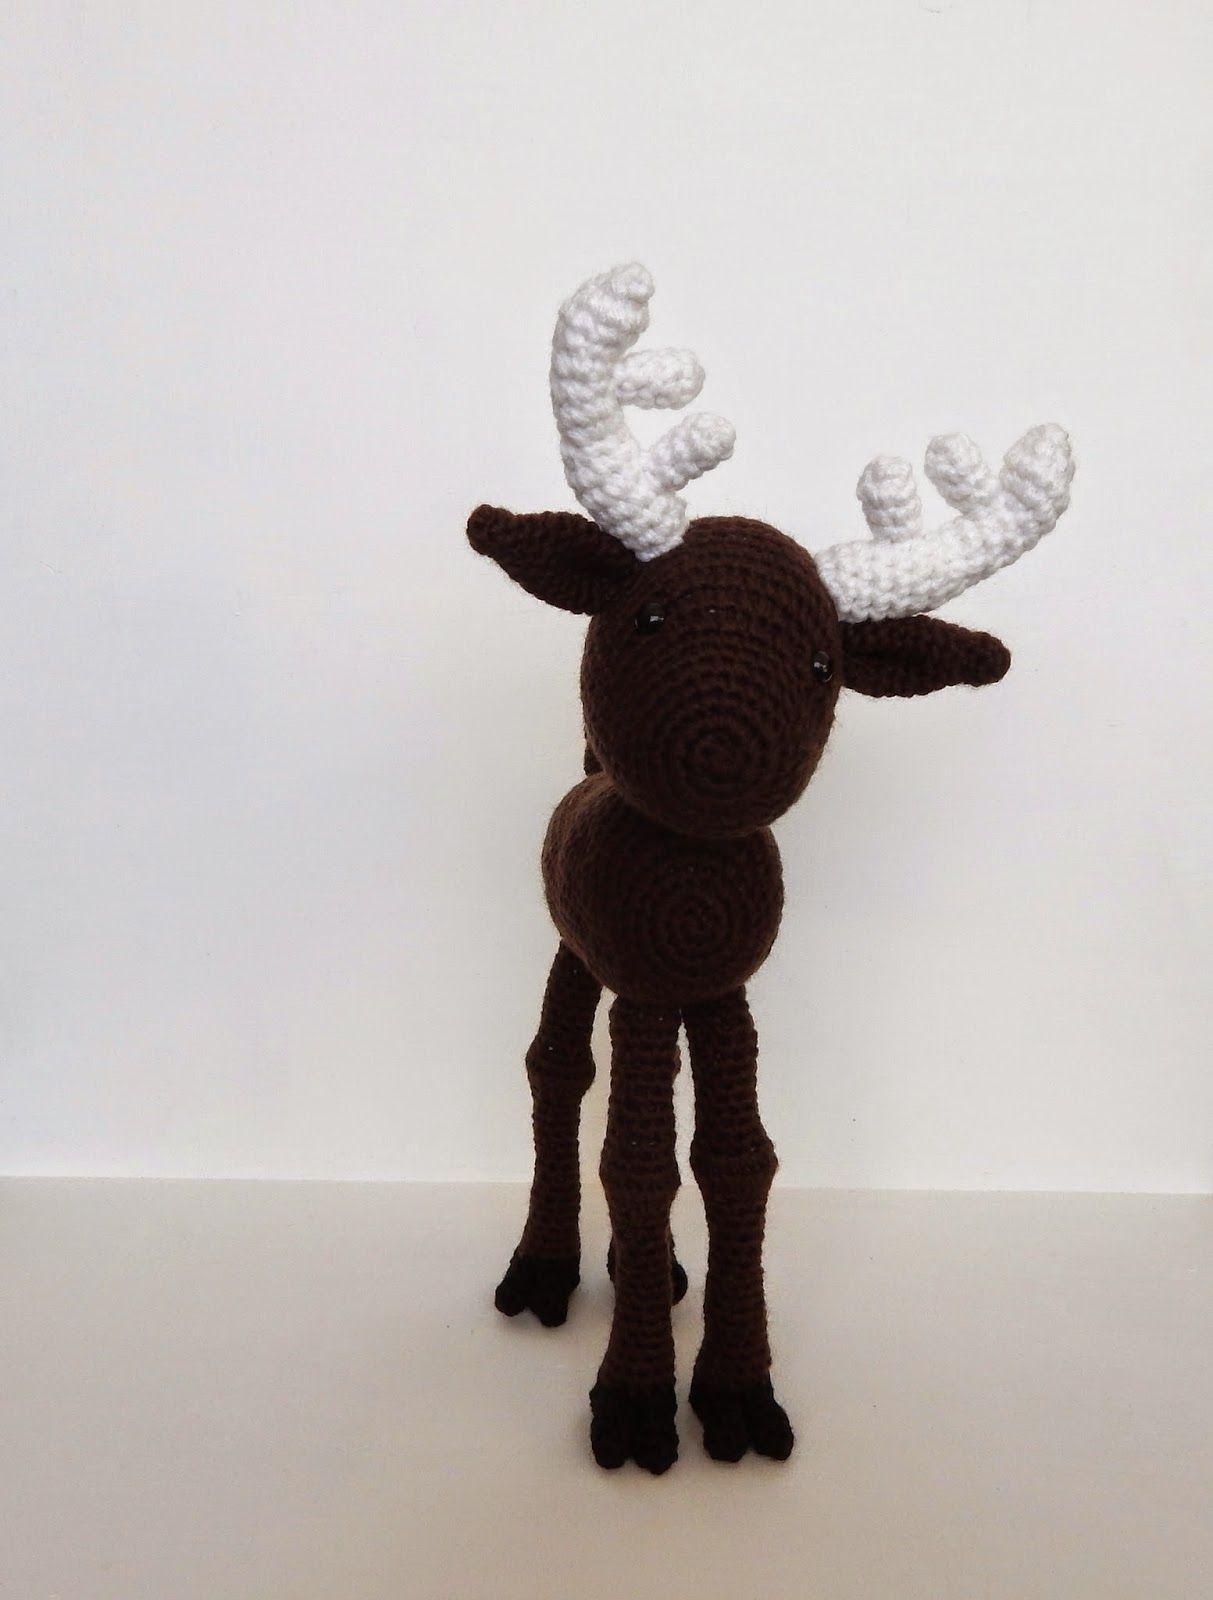 A[mi]dorable Crochet: Moose Pattern | yarn crafts | Pinterest ...